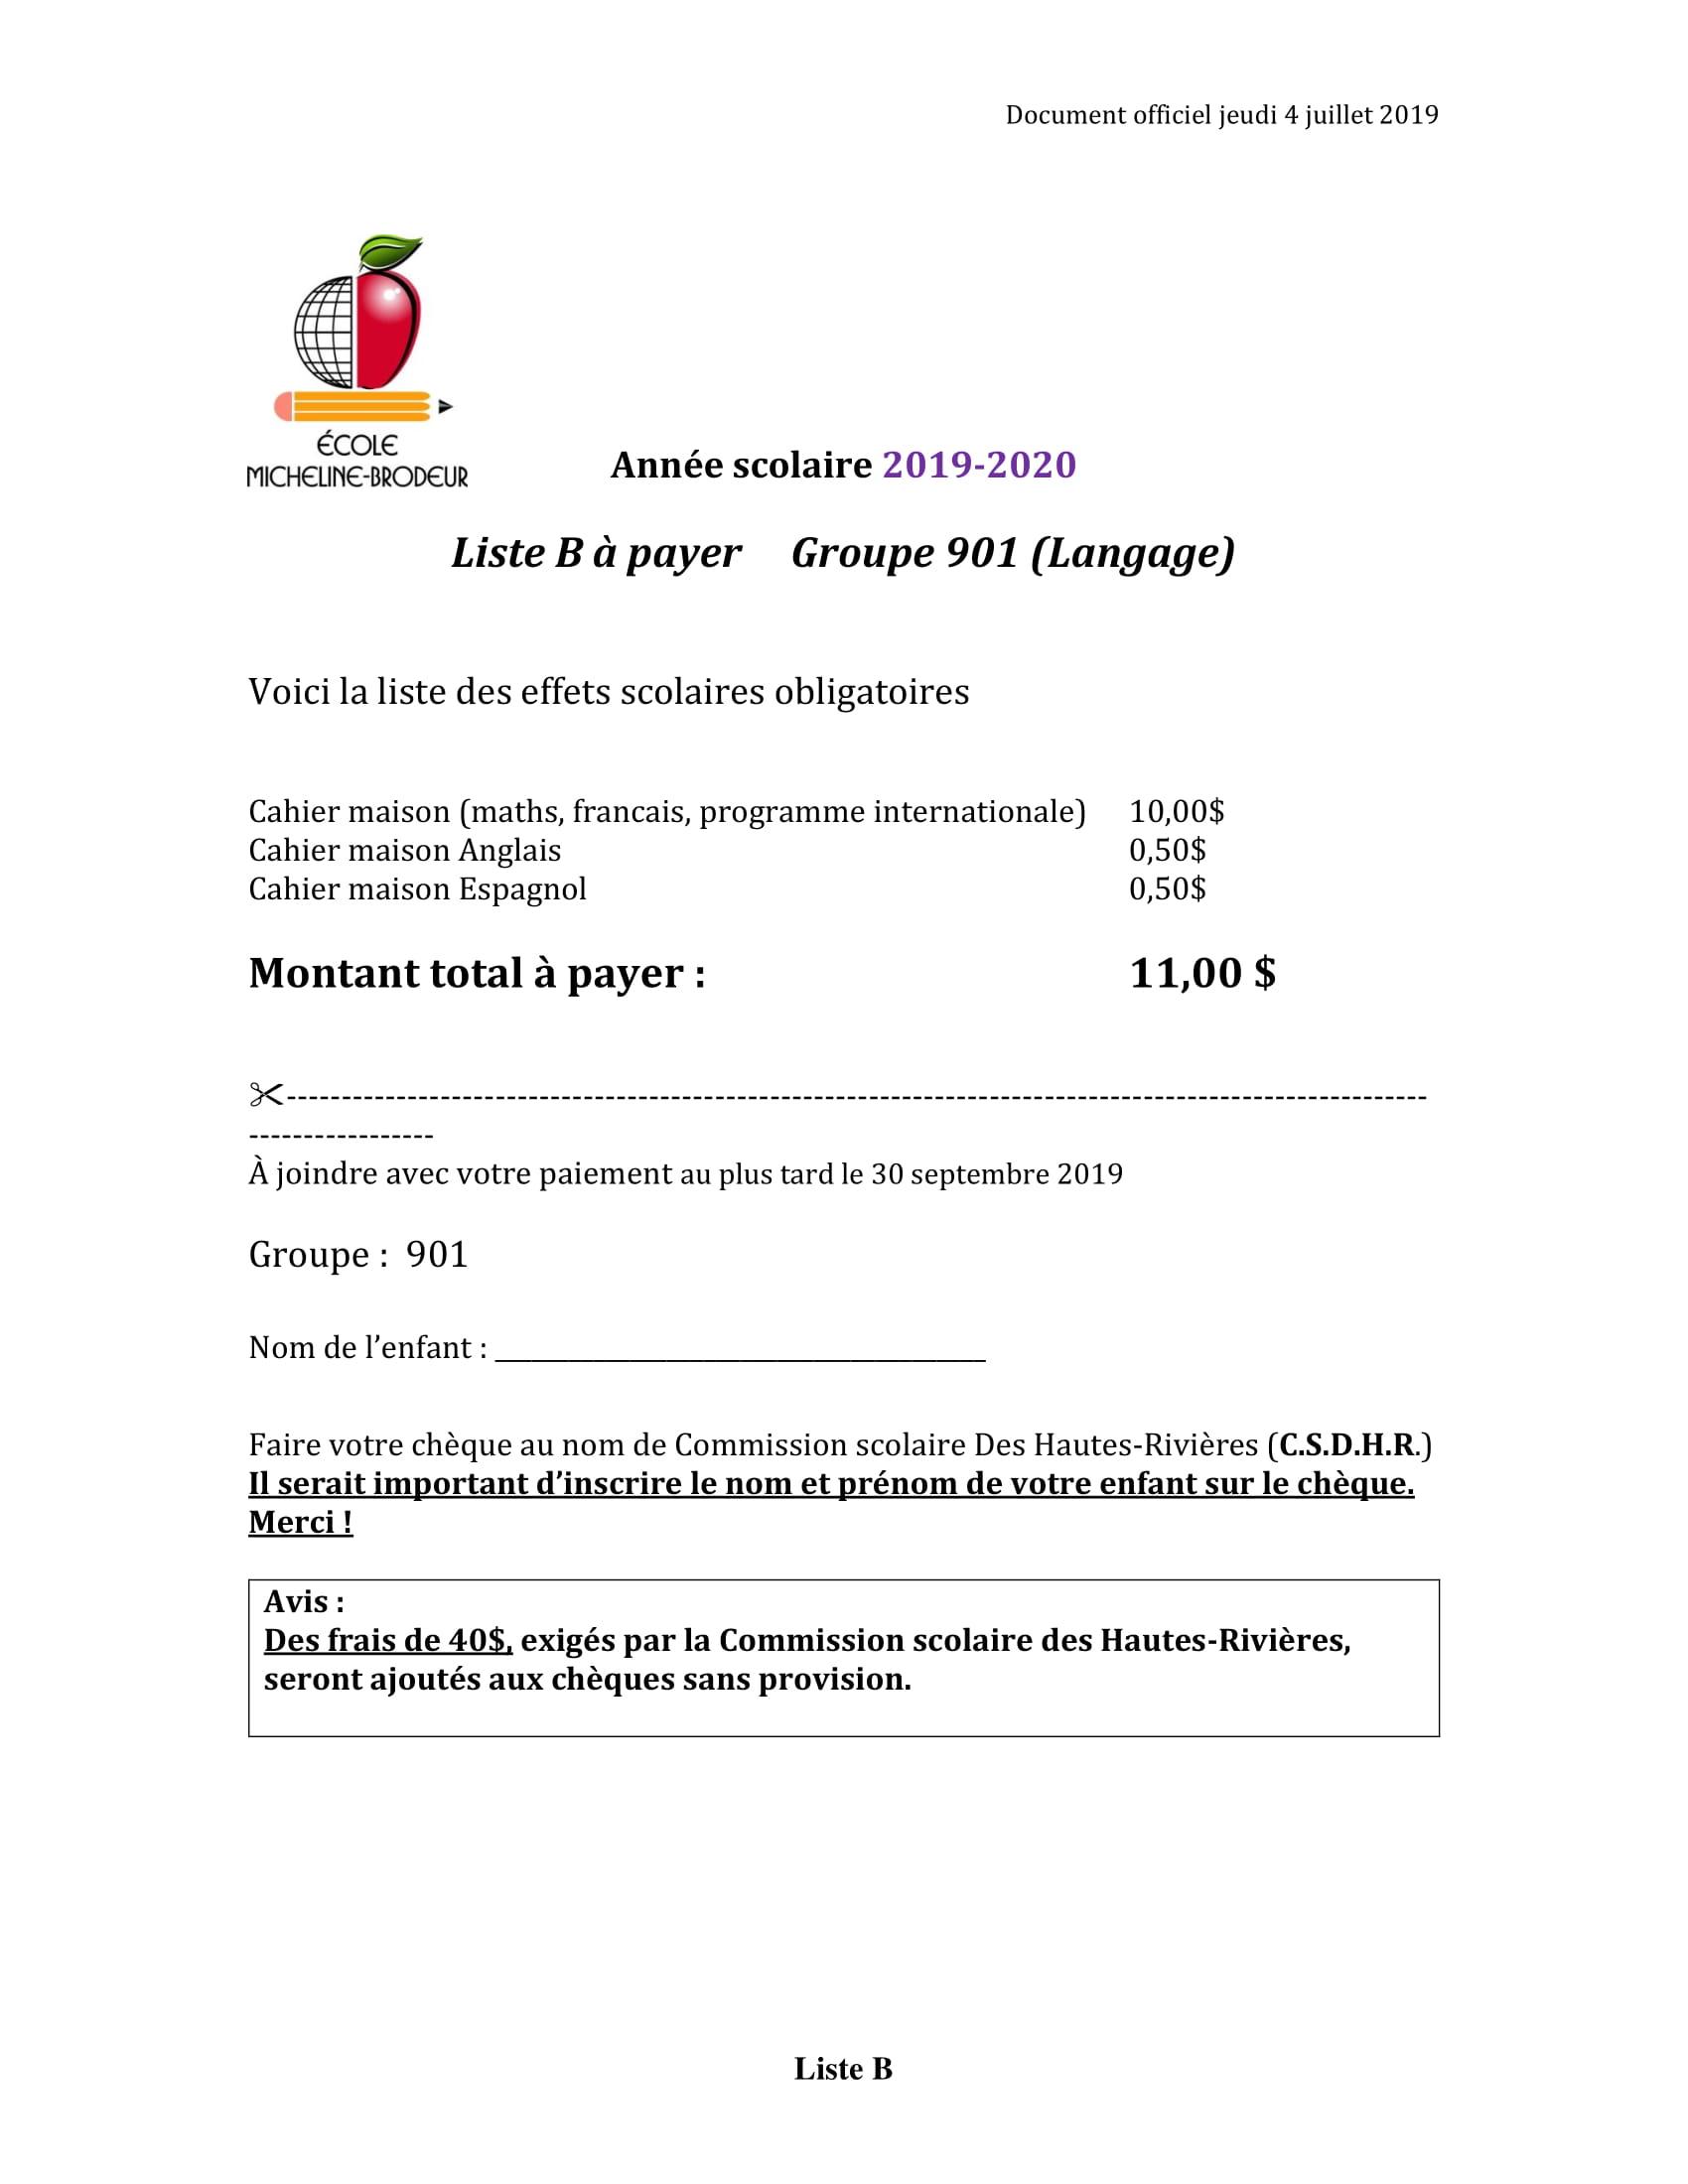 Liste B 2019-2020 pdf-01.jpg